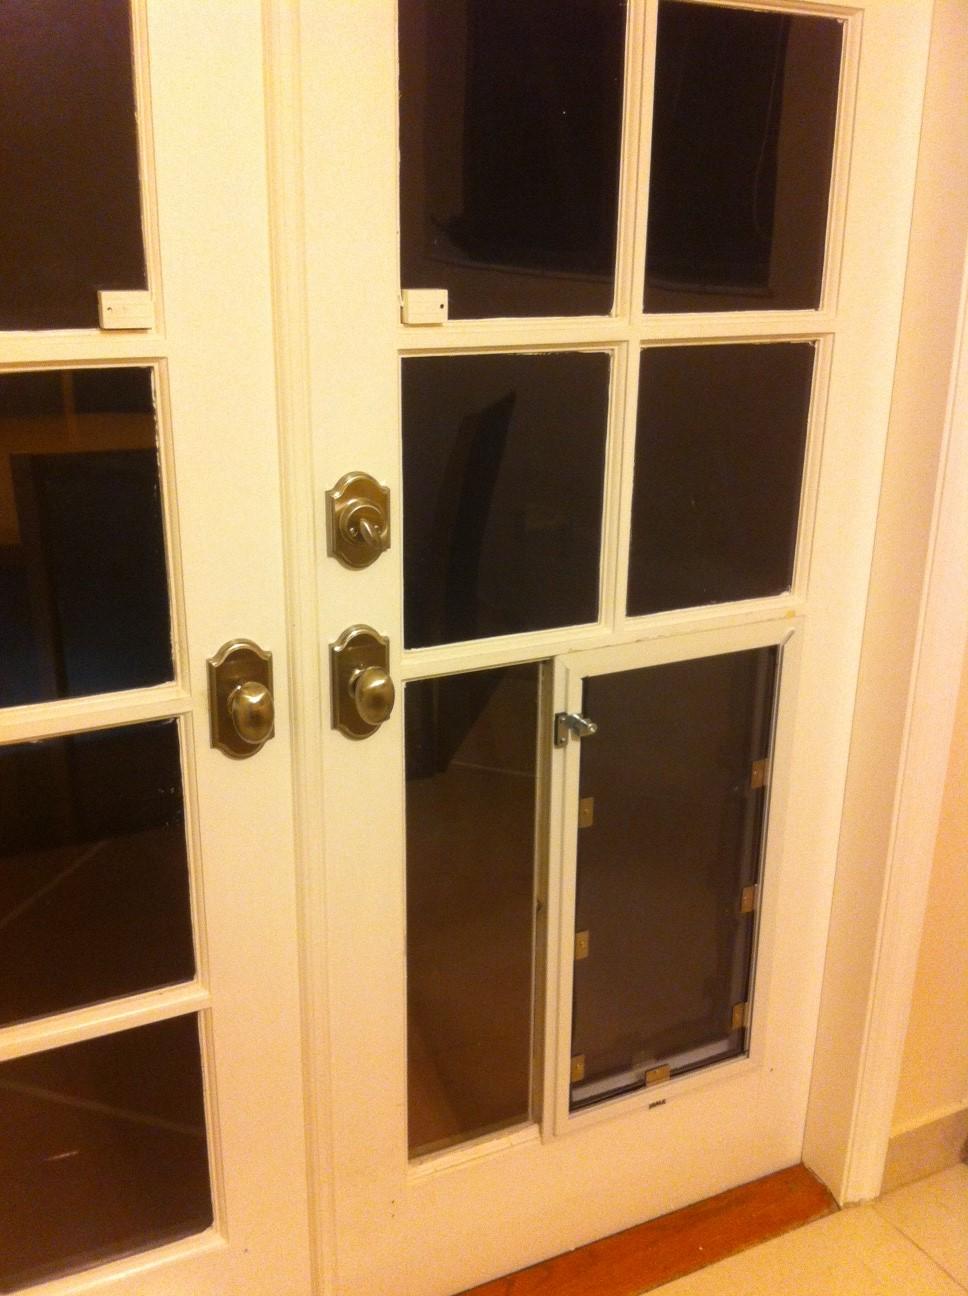 TOP 20 Custom And Classic French Doors With Dog Door - Used Patio Doors